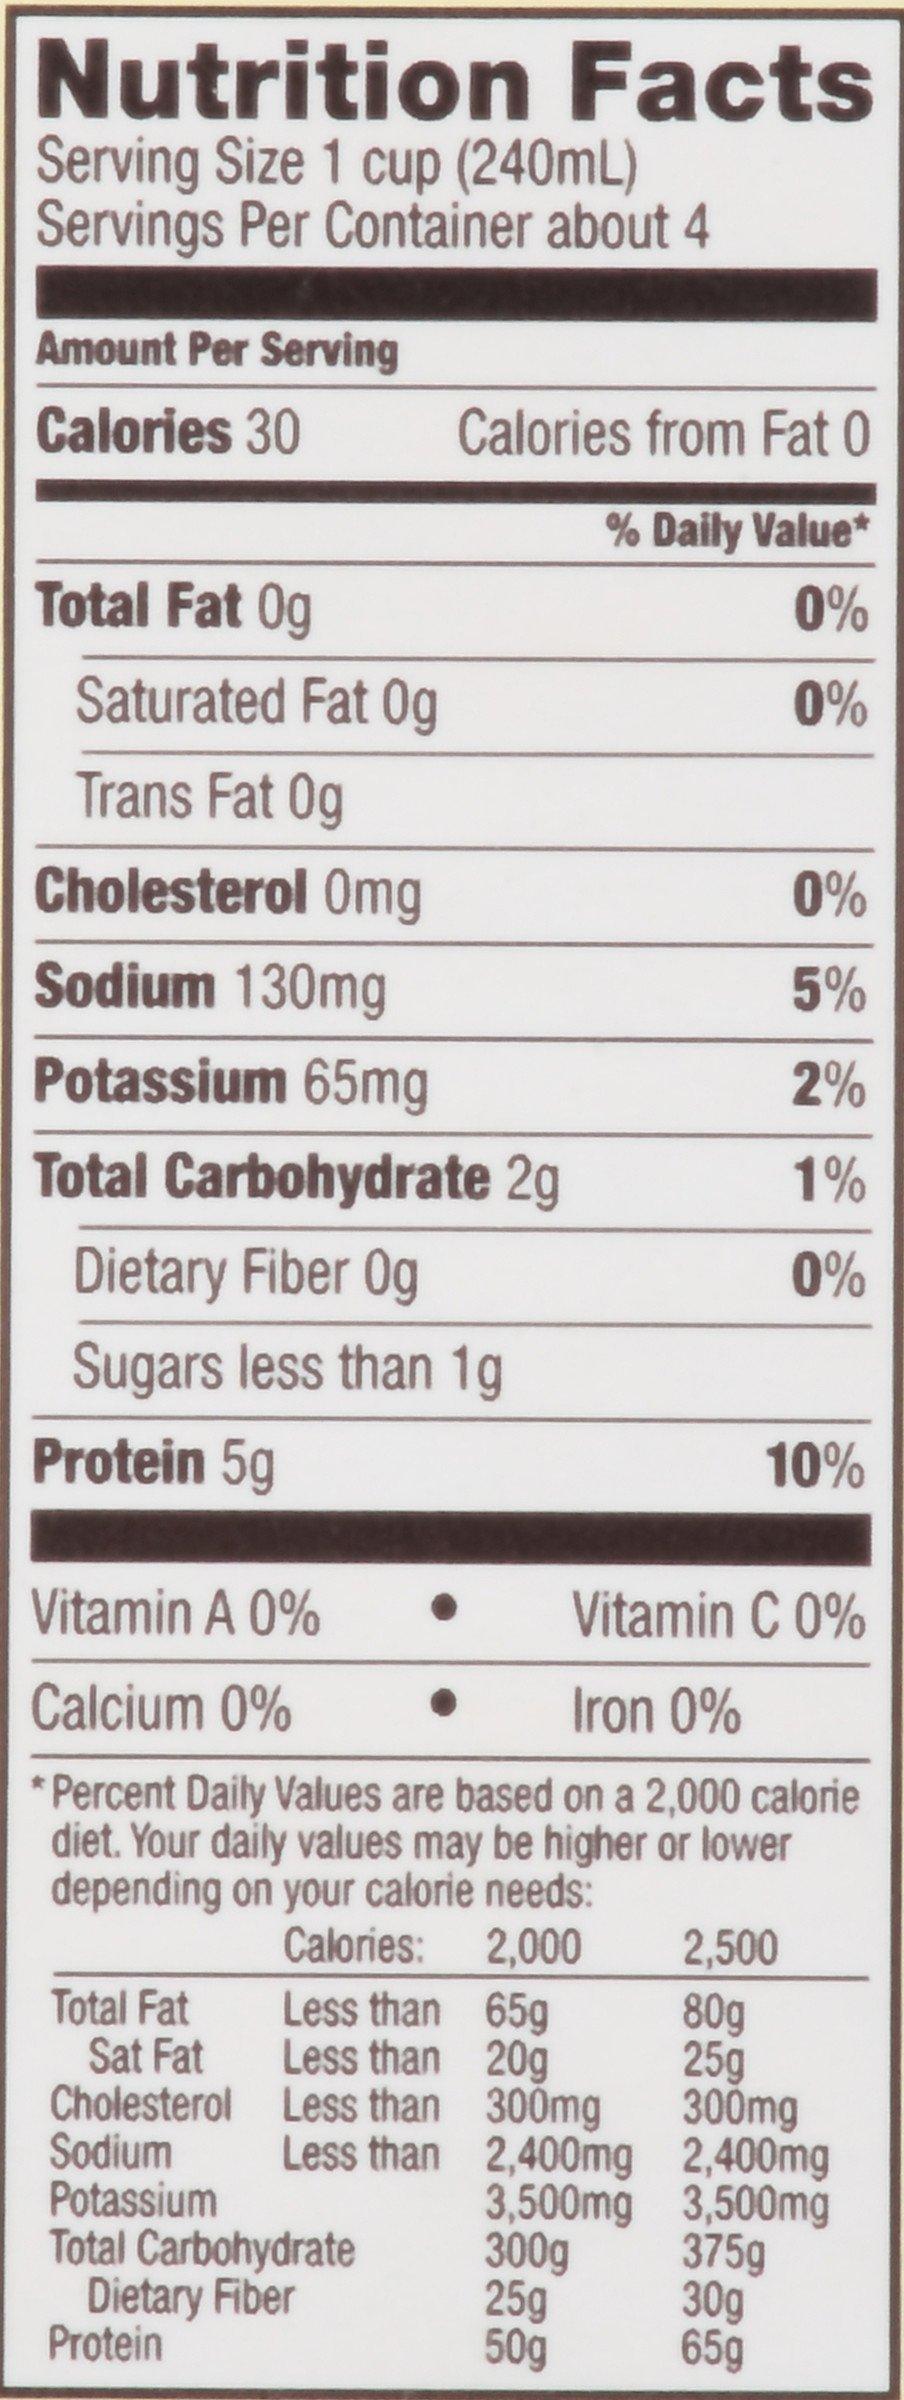 Kitchen Basics All Natural Unsalted Beef Stock, 32 fl oz by Kitchen Basics (Image #2)